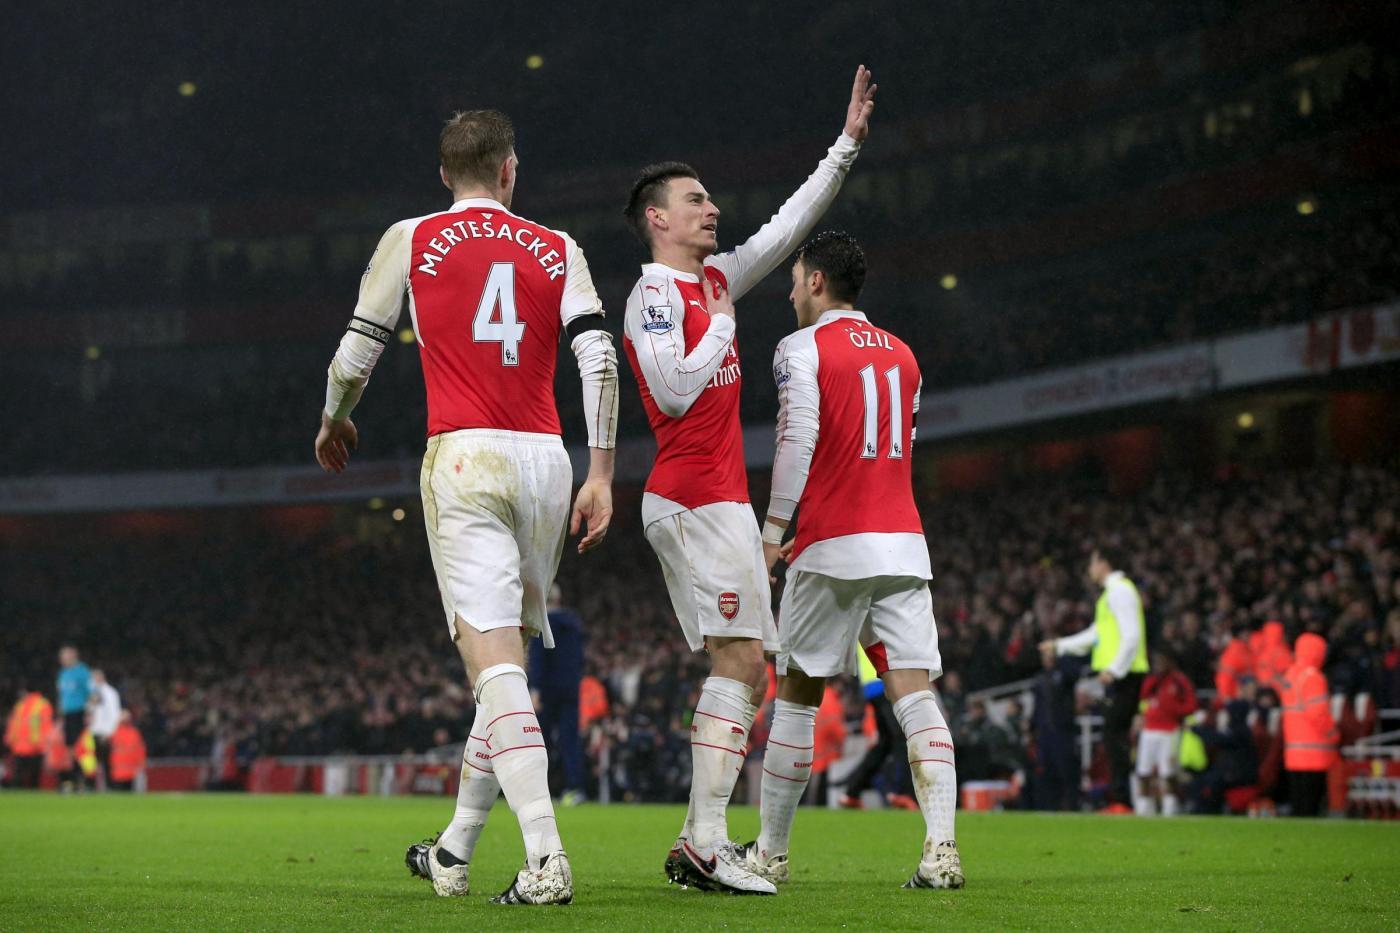 Swansea-Arsenal 30 gennaio, analisi e pronostico Premier League giornata 25